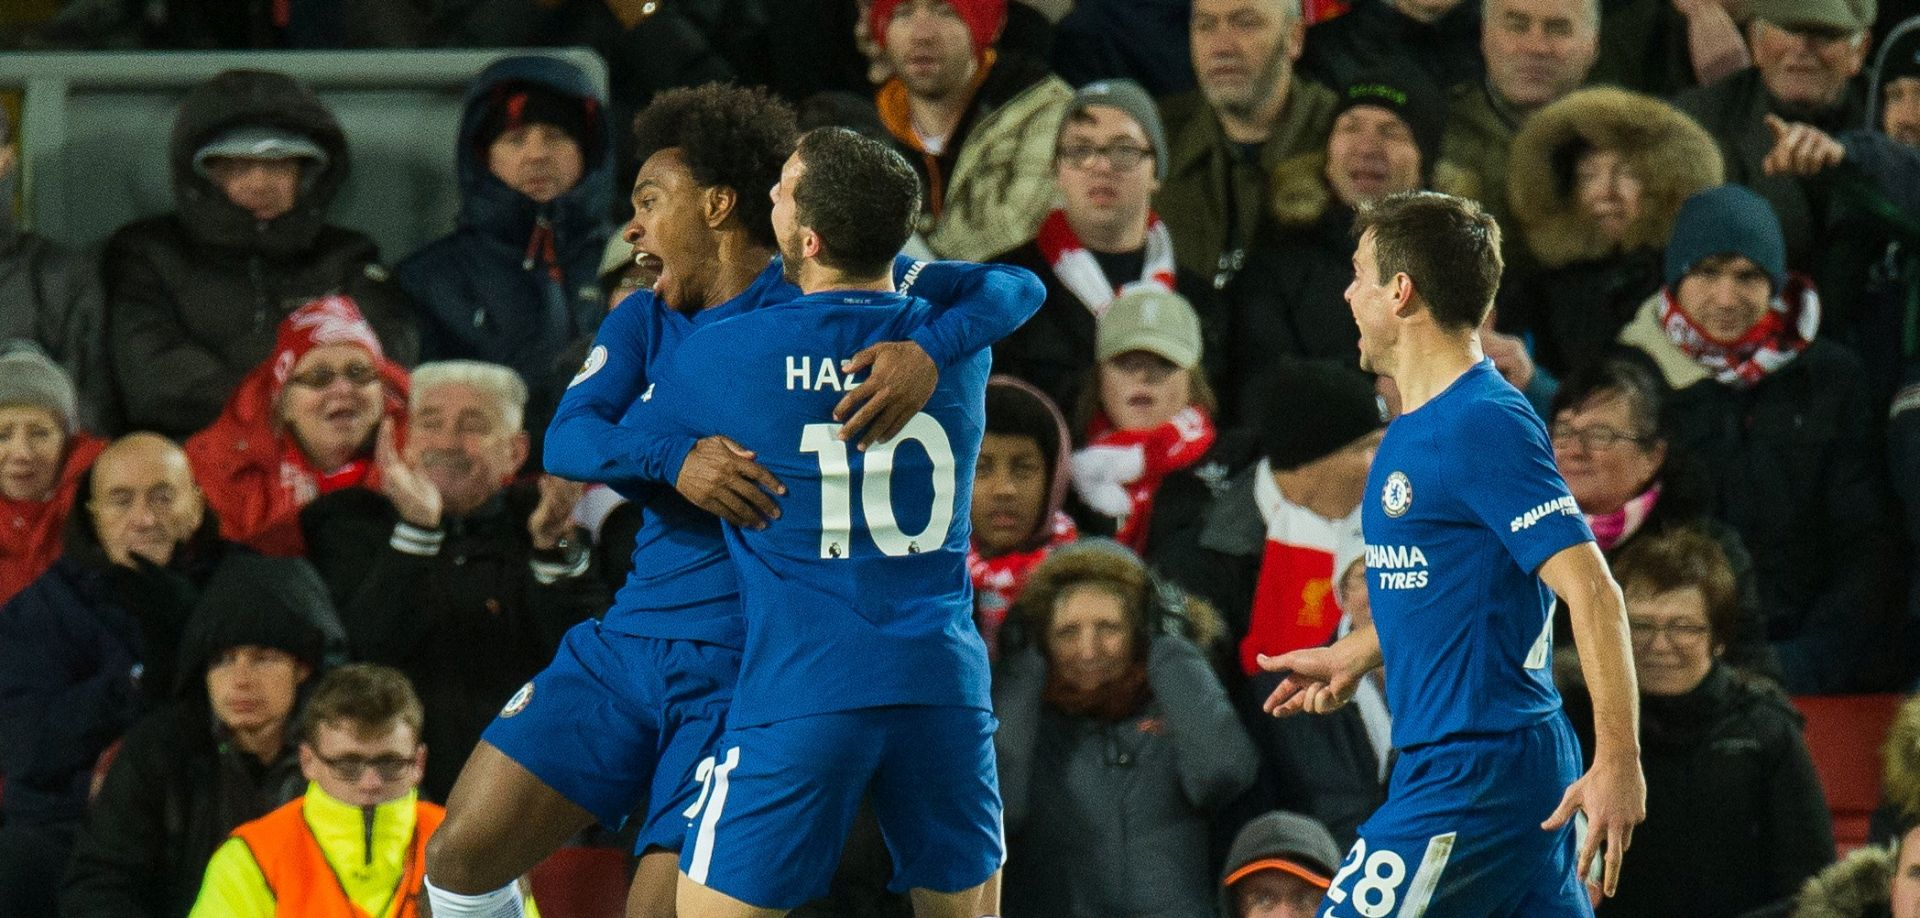 PREMIERLIGA Slavlje Chelseaja uz gol i dvije asistencije Williana